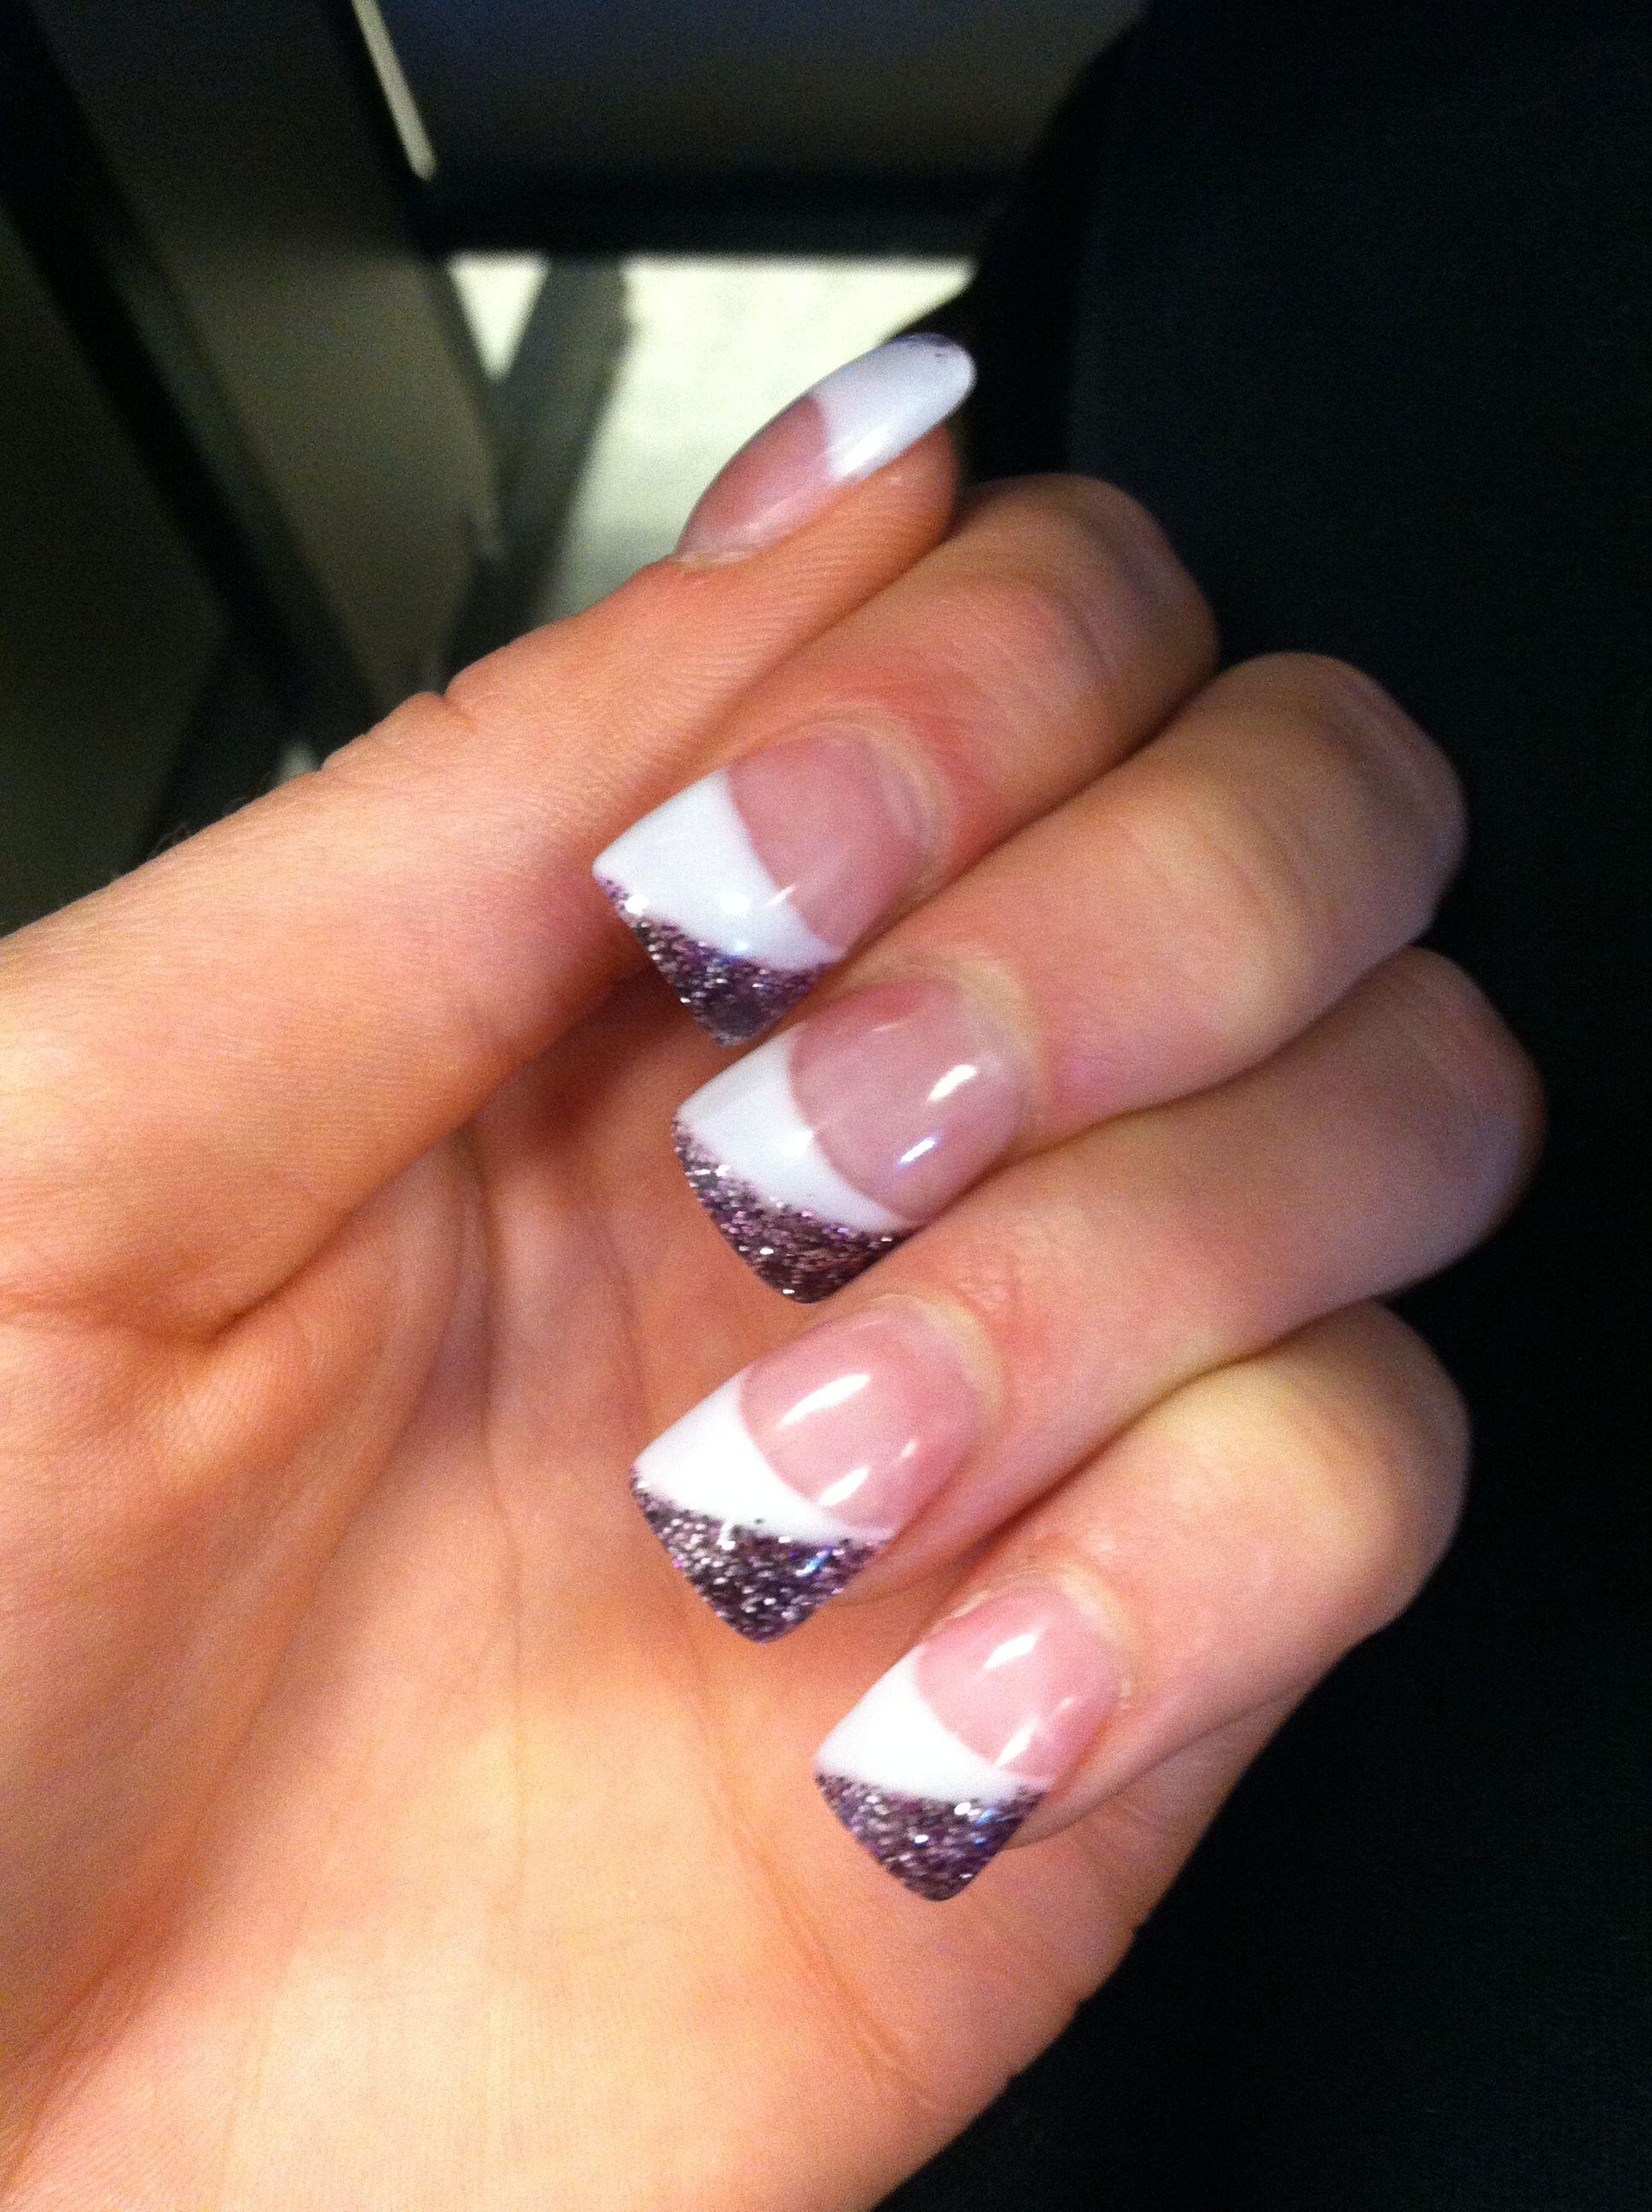 Purple sparkly fake nails | Beauty | Pinterest | Makeup, Hair makeup ...